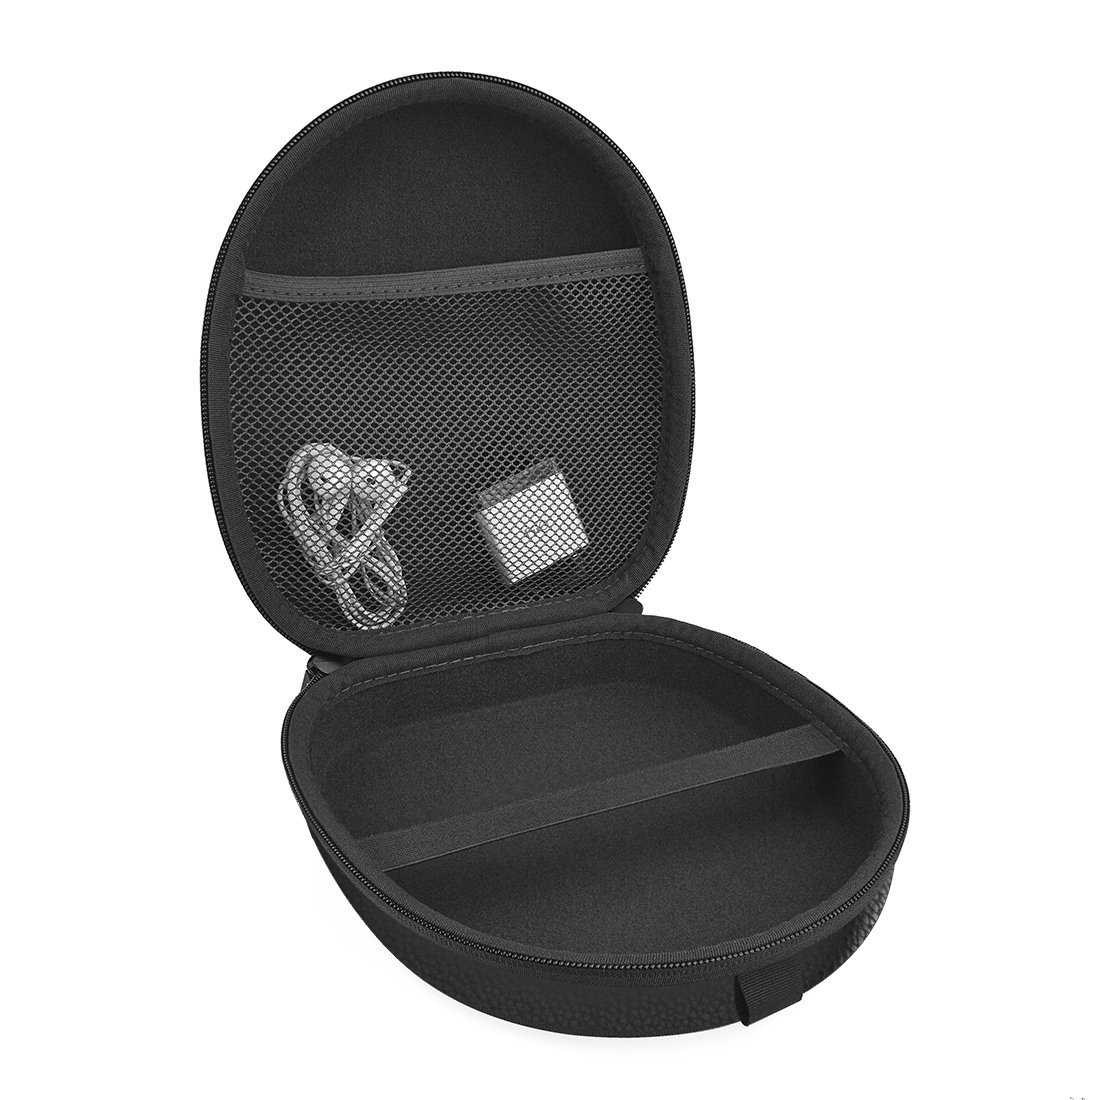 ATH ESW9 WS99BT ES700 FC700 WS33X S100 ES7 ES10 ANC20 ES500 // Hard Shell Carrying Case // Protective Travel Bag Black Geekria Headphones Case for XO Vision IR620 IR630 IR630R AKG Y50 Y50BT